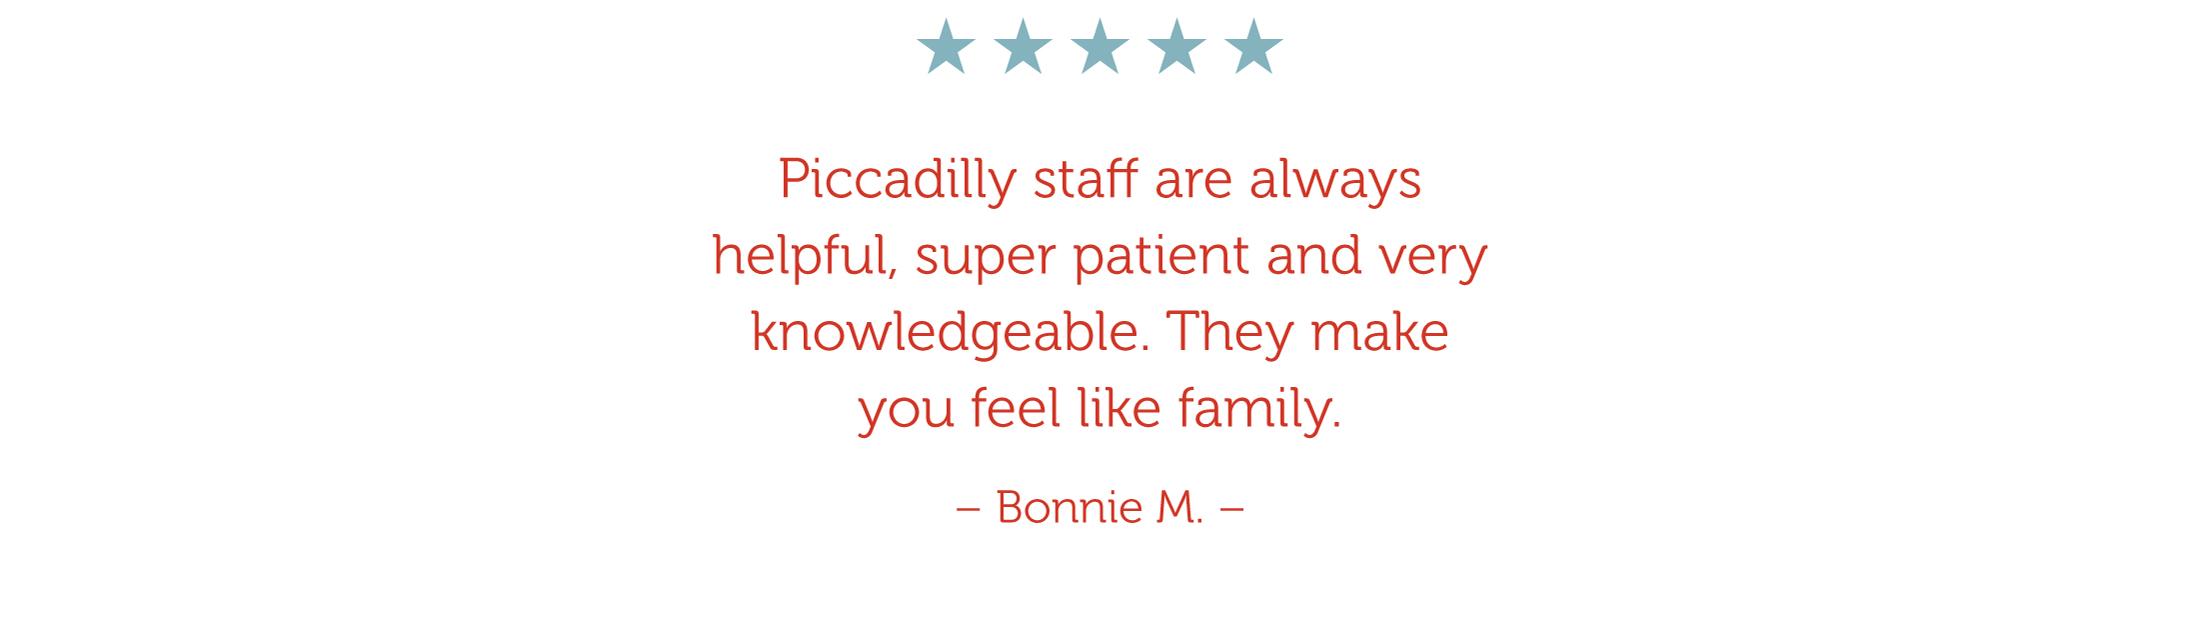 pc-review-bonnie-m-1x3.jpg